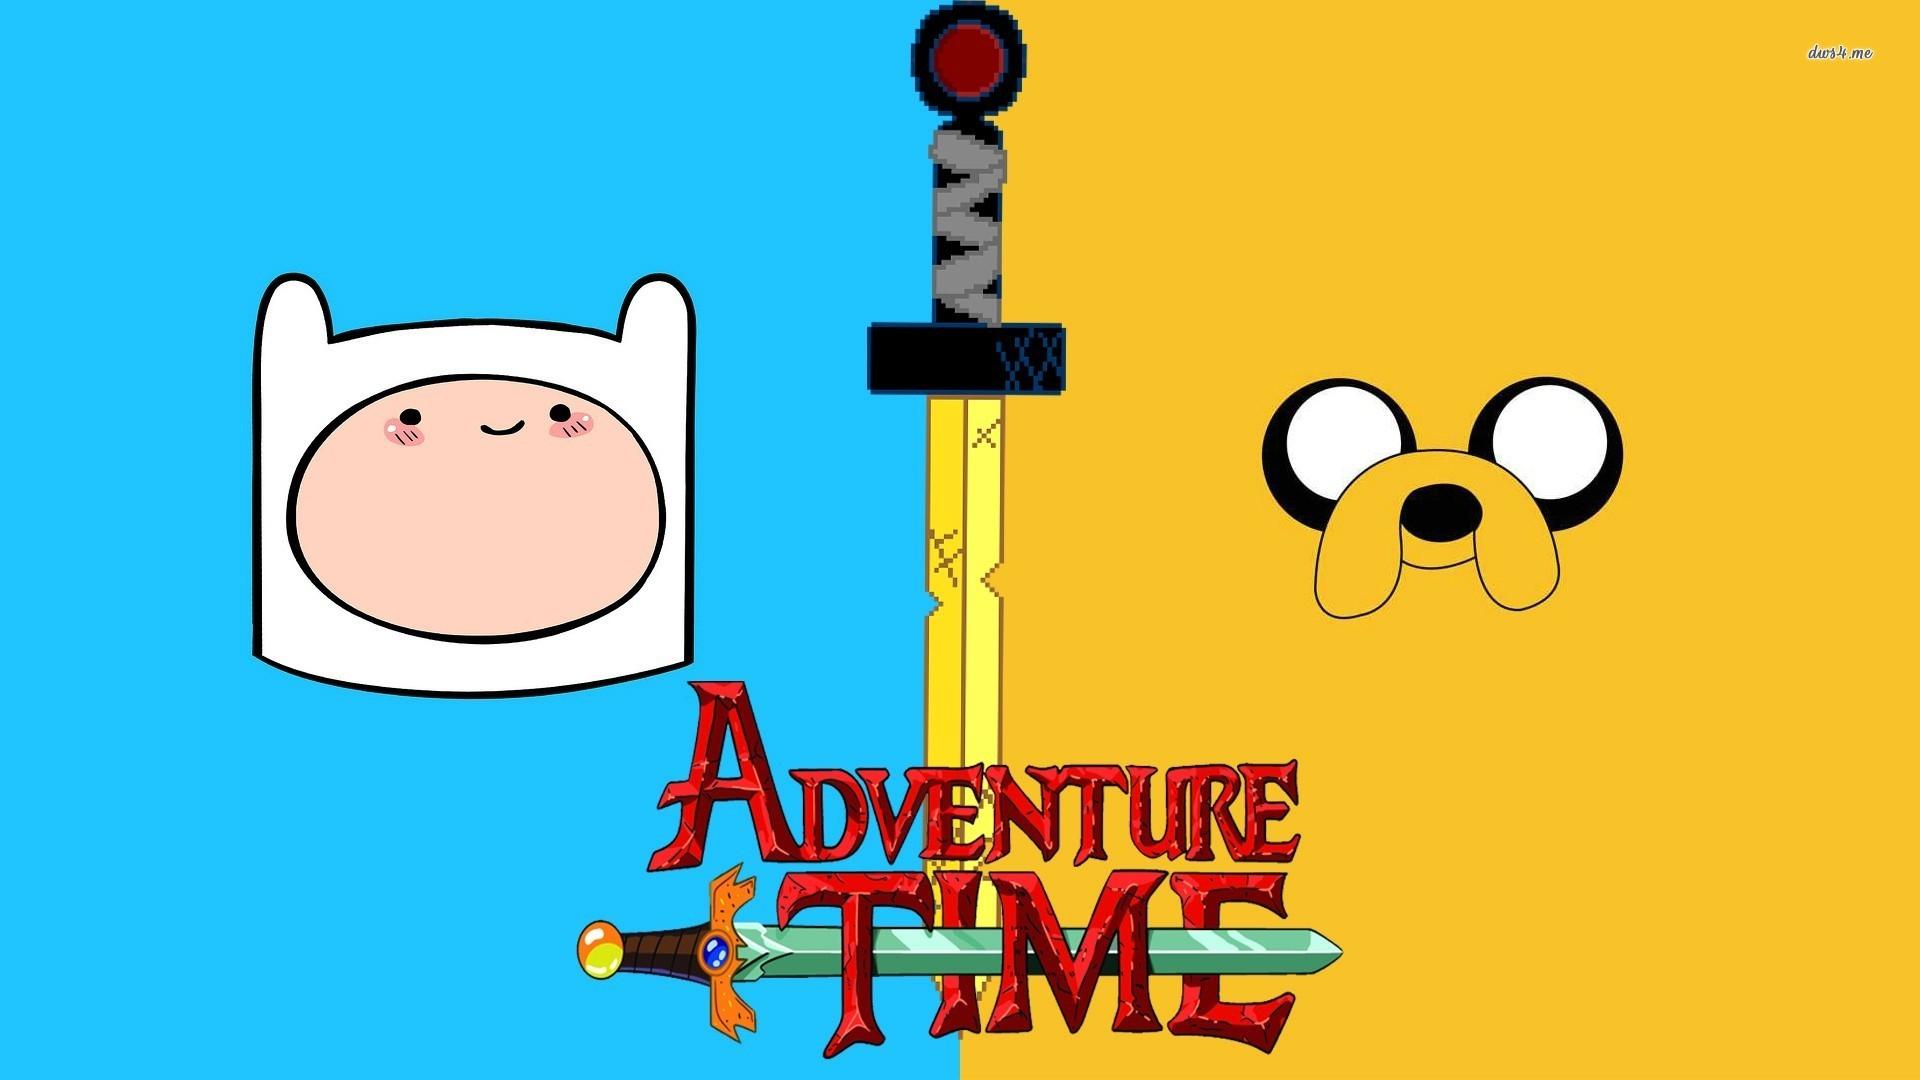 Finn and Jake   Adventure Time Wallpaper 1920x1080 12481 1920x1080